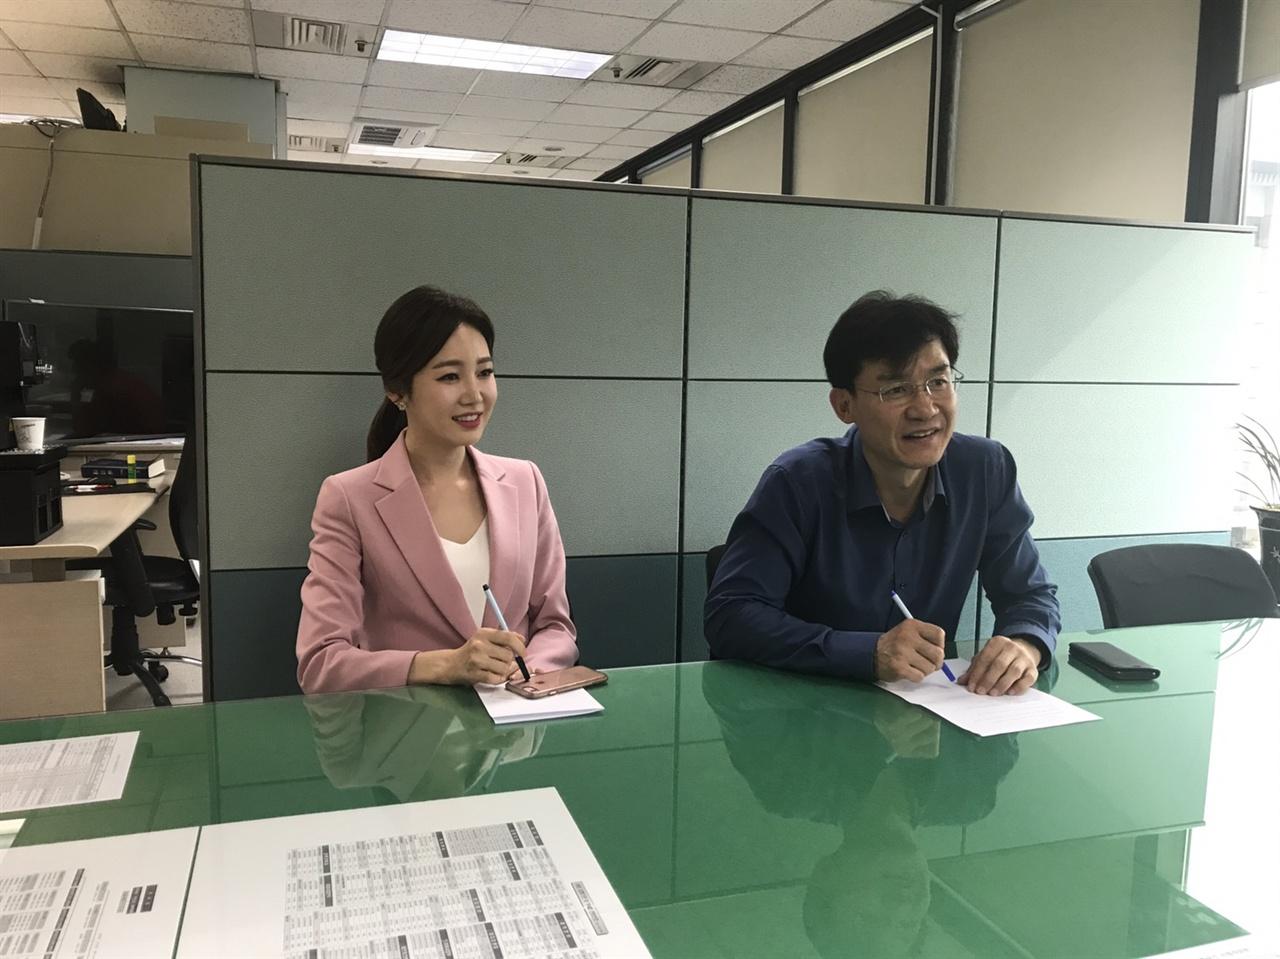 KBS <뉴스9>의 김철민)(우), 김솔희(좌) 앵커가 <오마이뉴스>와 인터뷰를 하고 있다.